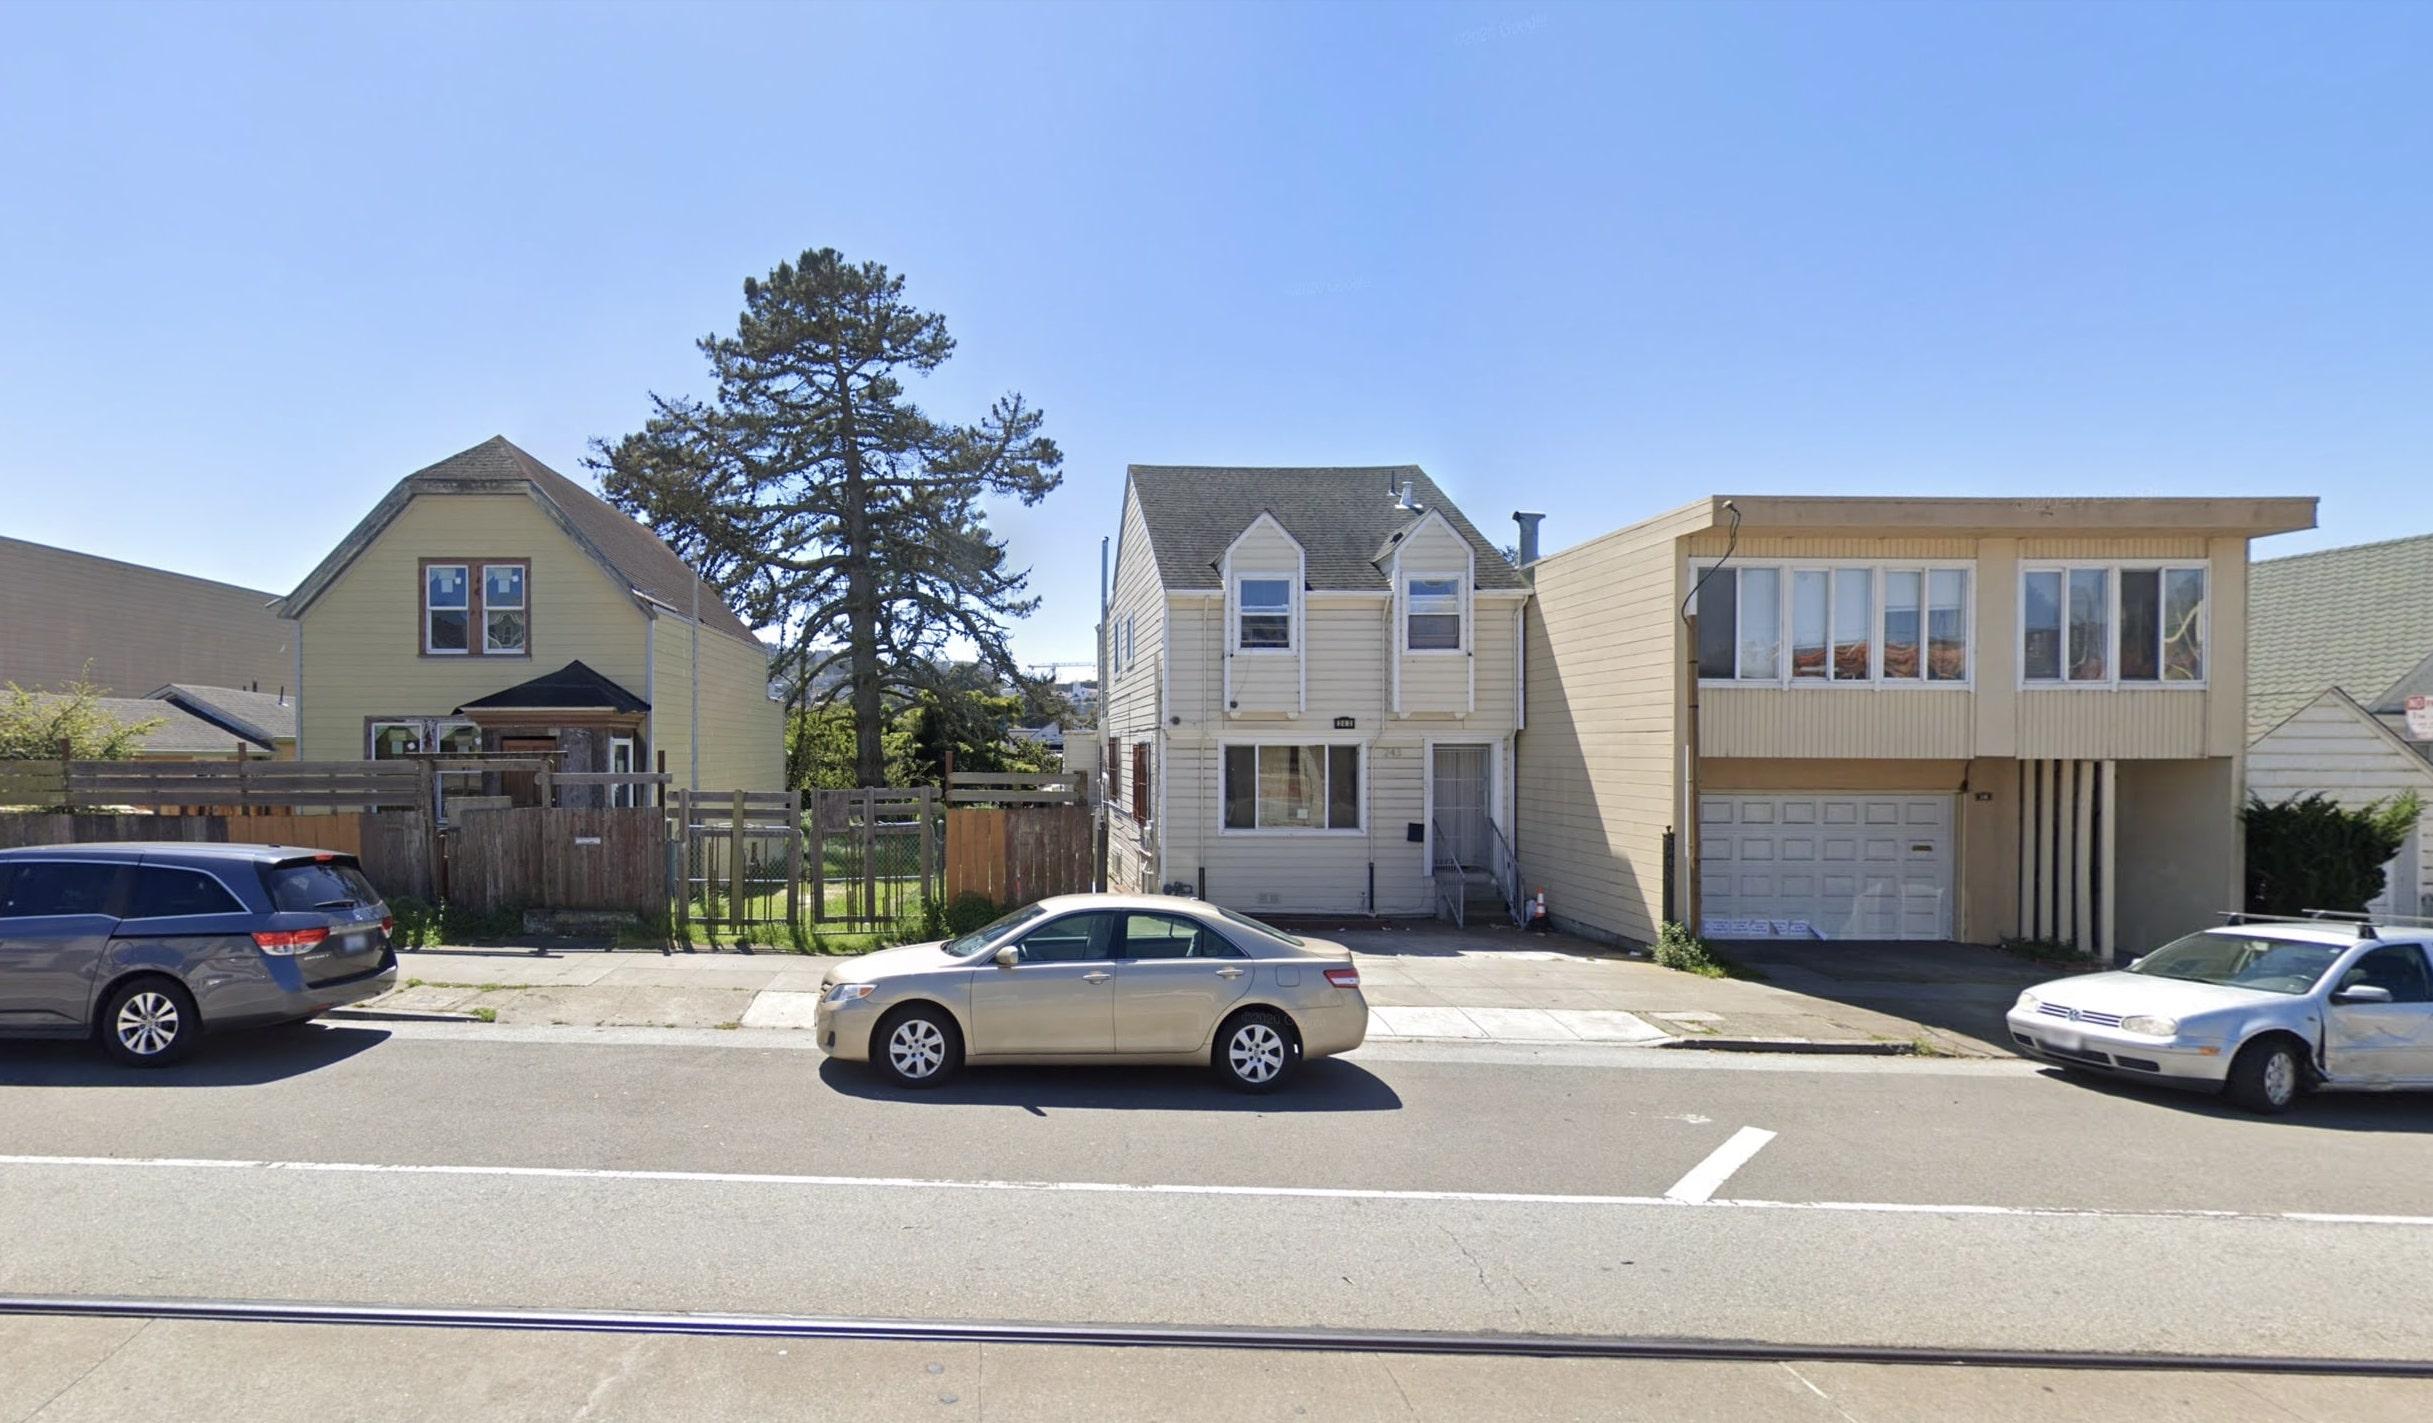 239 Broad Street, Street View